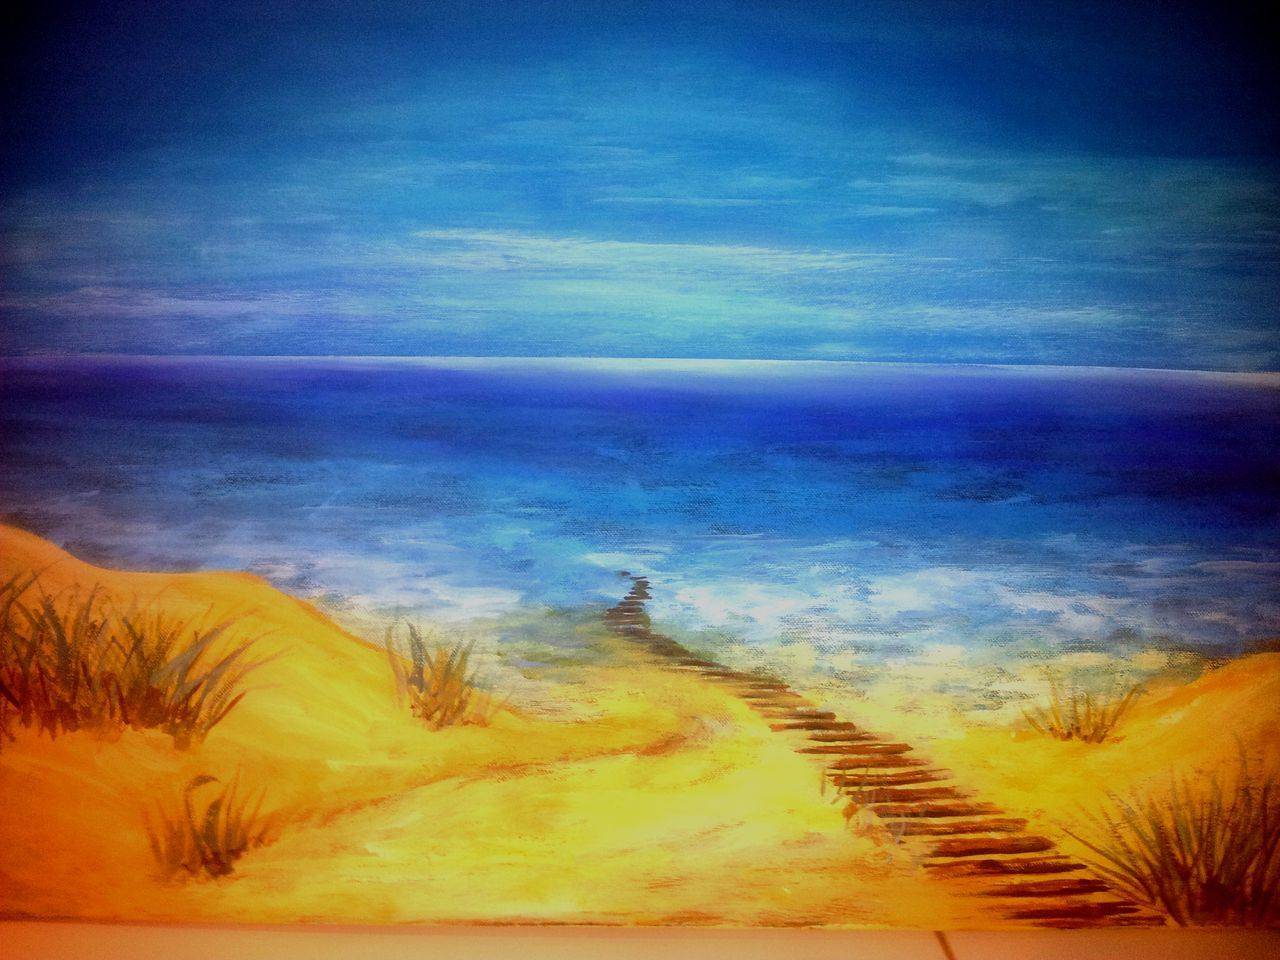 bild acrylmalerei malerei landschaften strandbilder von nobbydo bei kunstnet. Black Bedroom Furniture Sets. Home Design Ideas